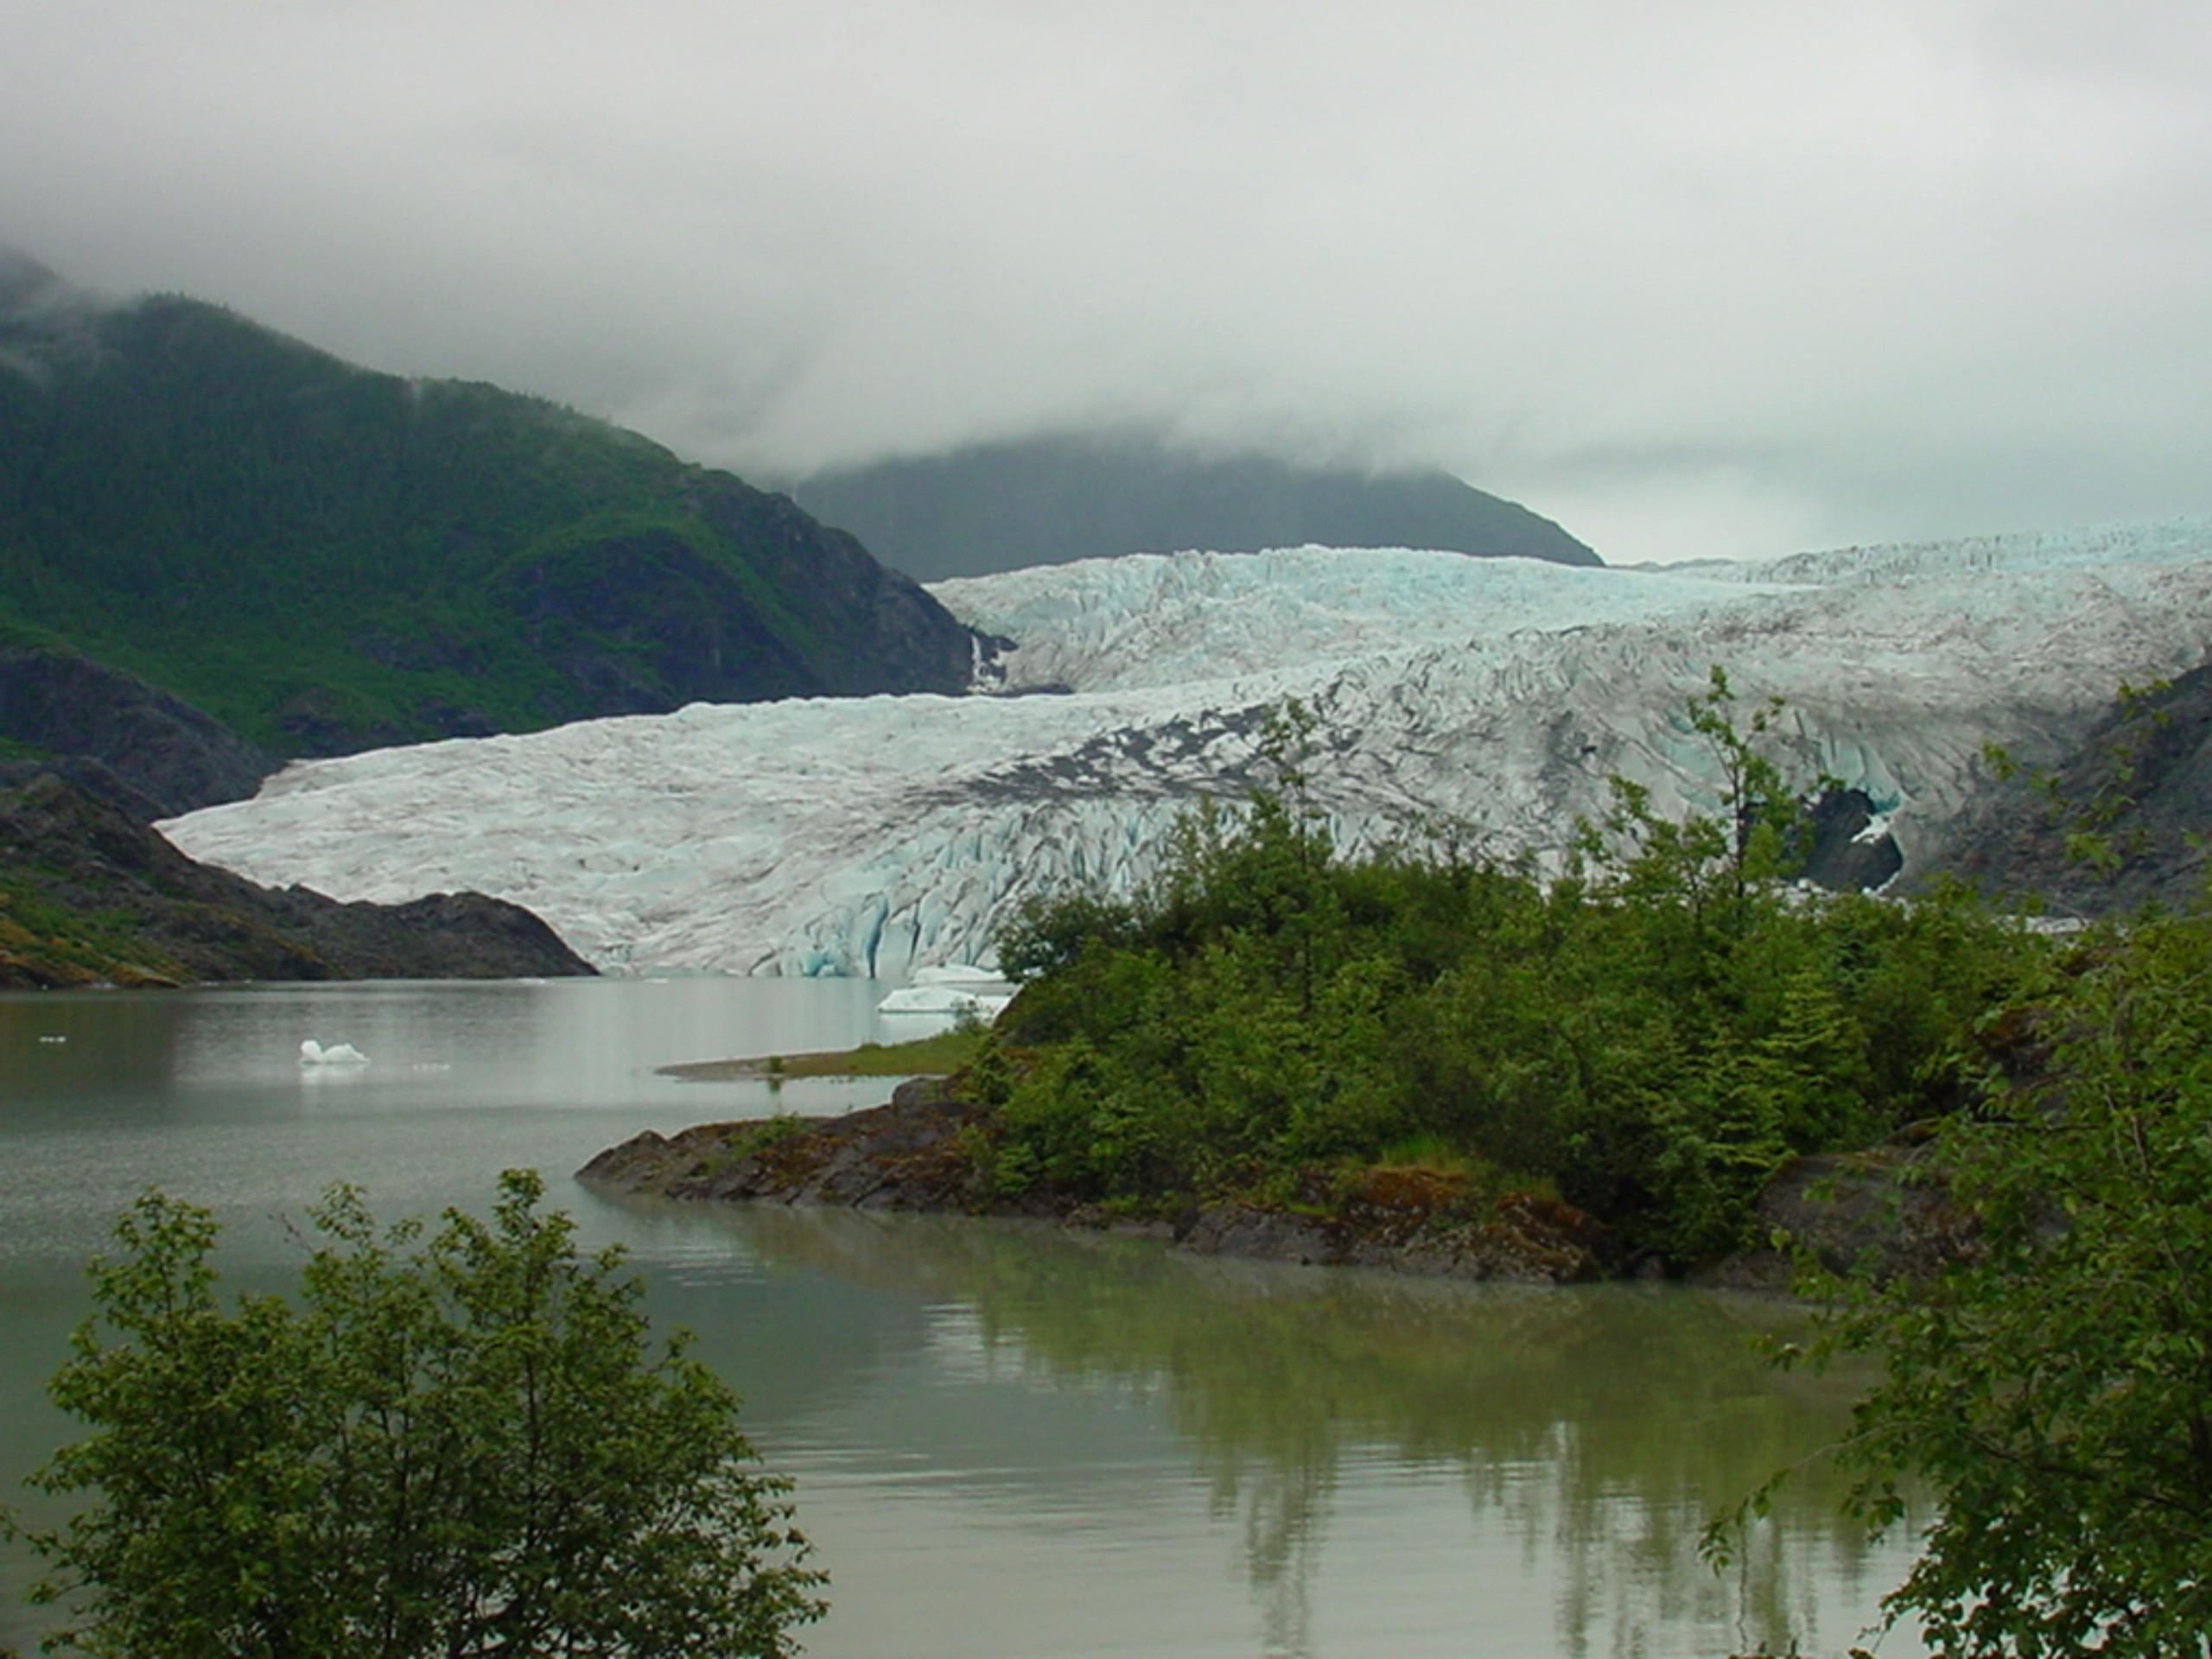 Pin 2560x1920 Alaska Ice Glacier Wallpaper For Pc Mac Iphone And Ipad 2560x1920